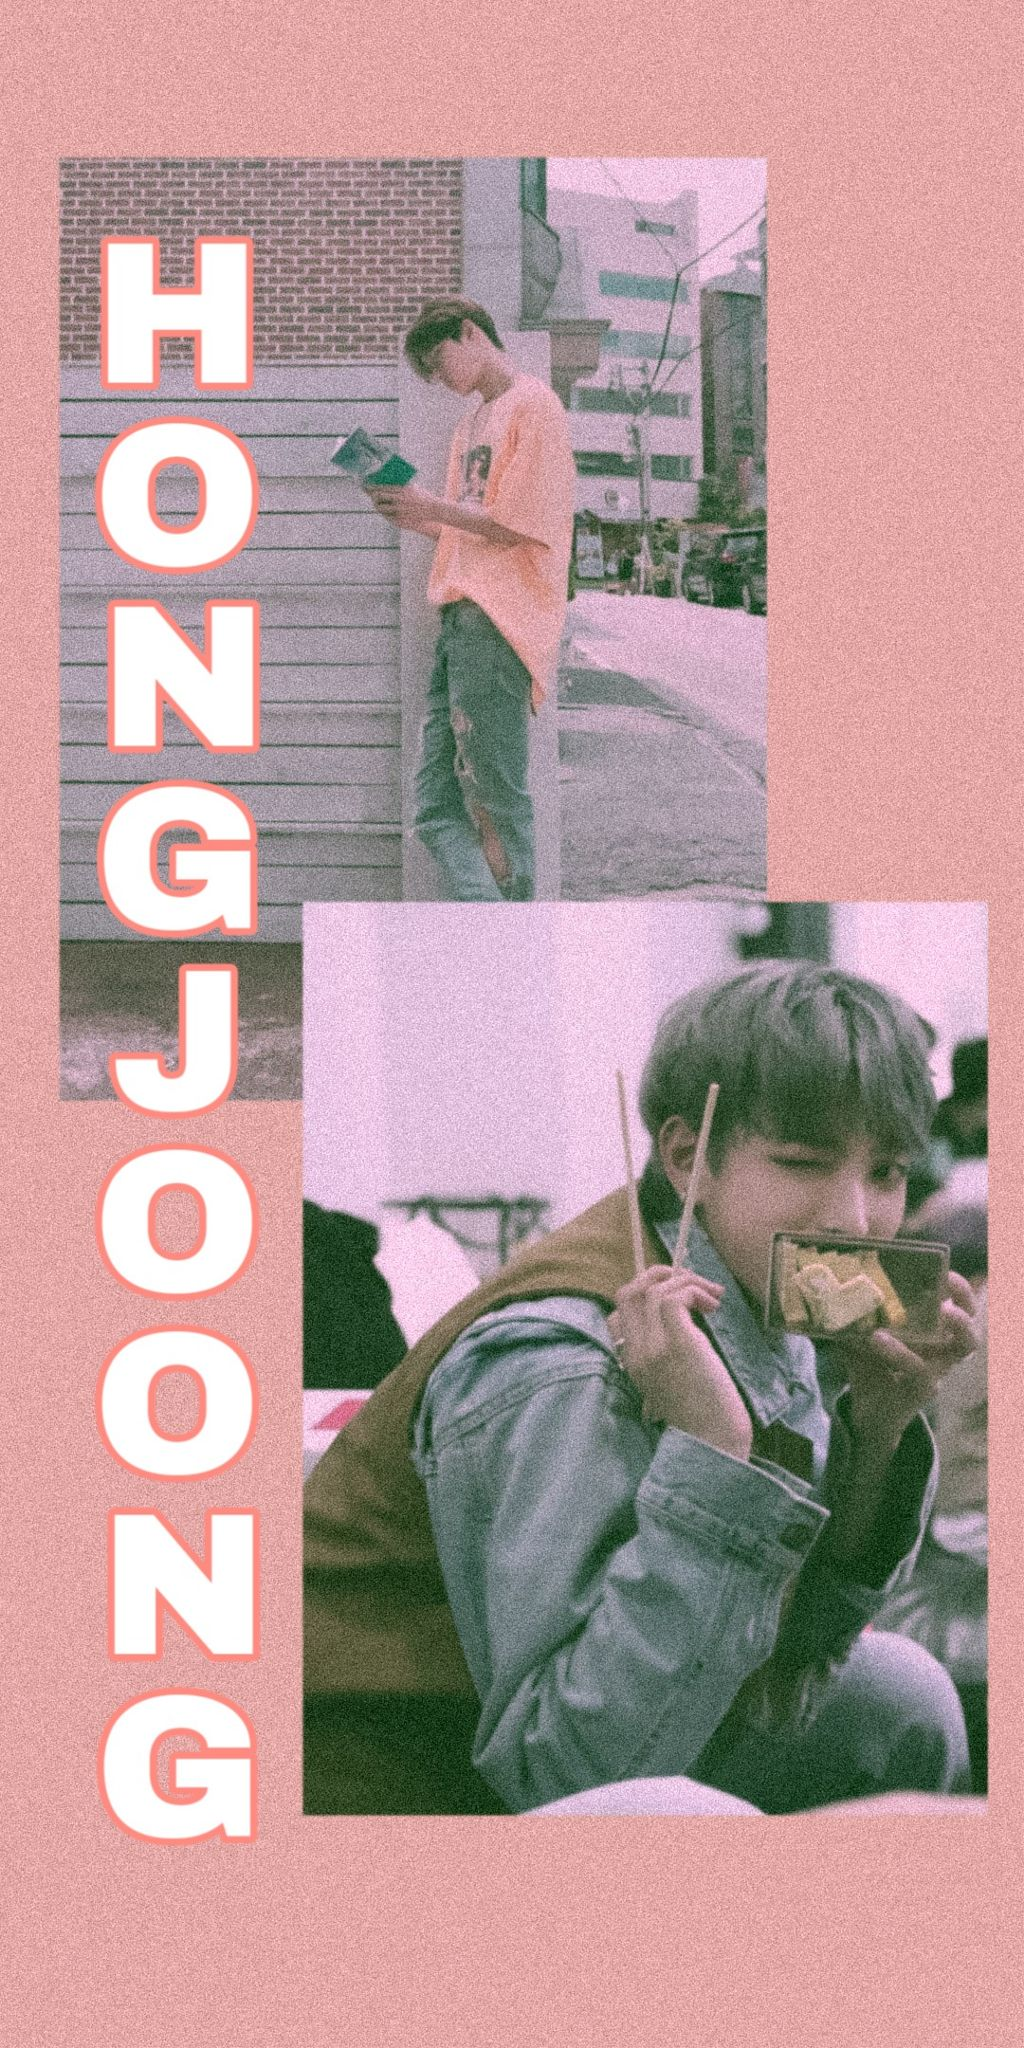 Ateez Hongjoong Kqfellaz Kpop Wallpaper